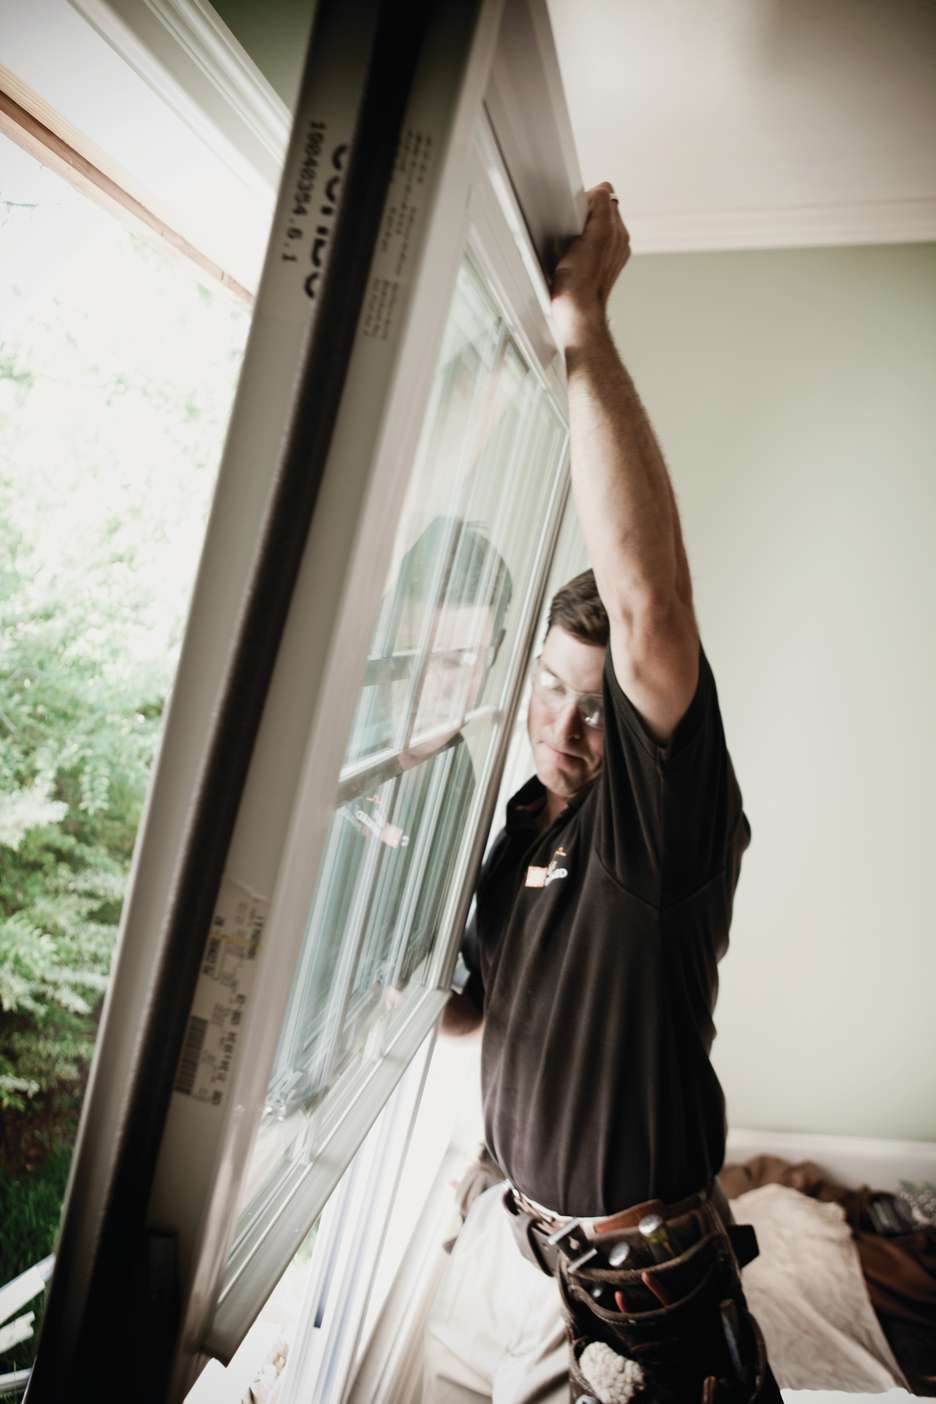 Home Services at The Home Depot - painter  | Photo 3 of 10 | Address: 1551 Dunlawton Blvd, Port Orange, FL 32127, USA | Phone: (386) 361-3452